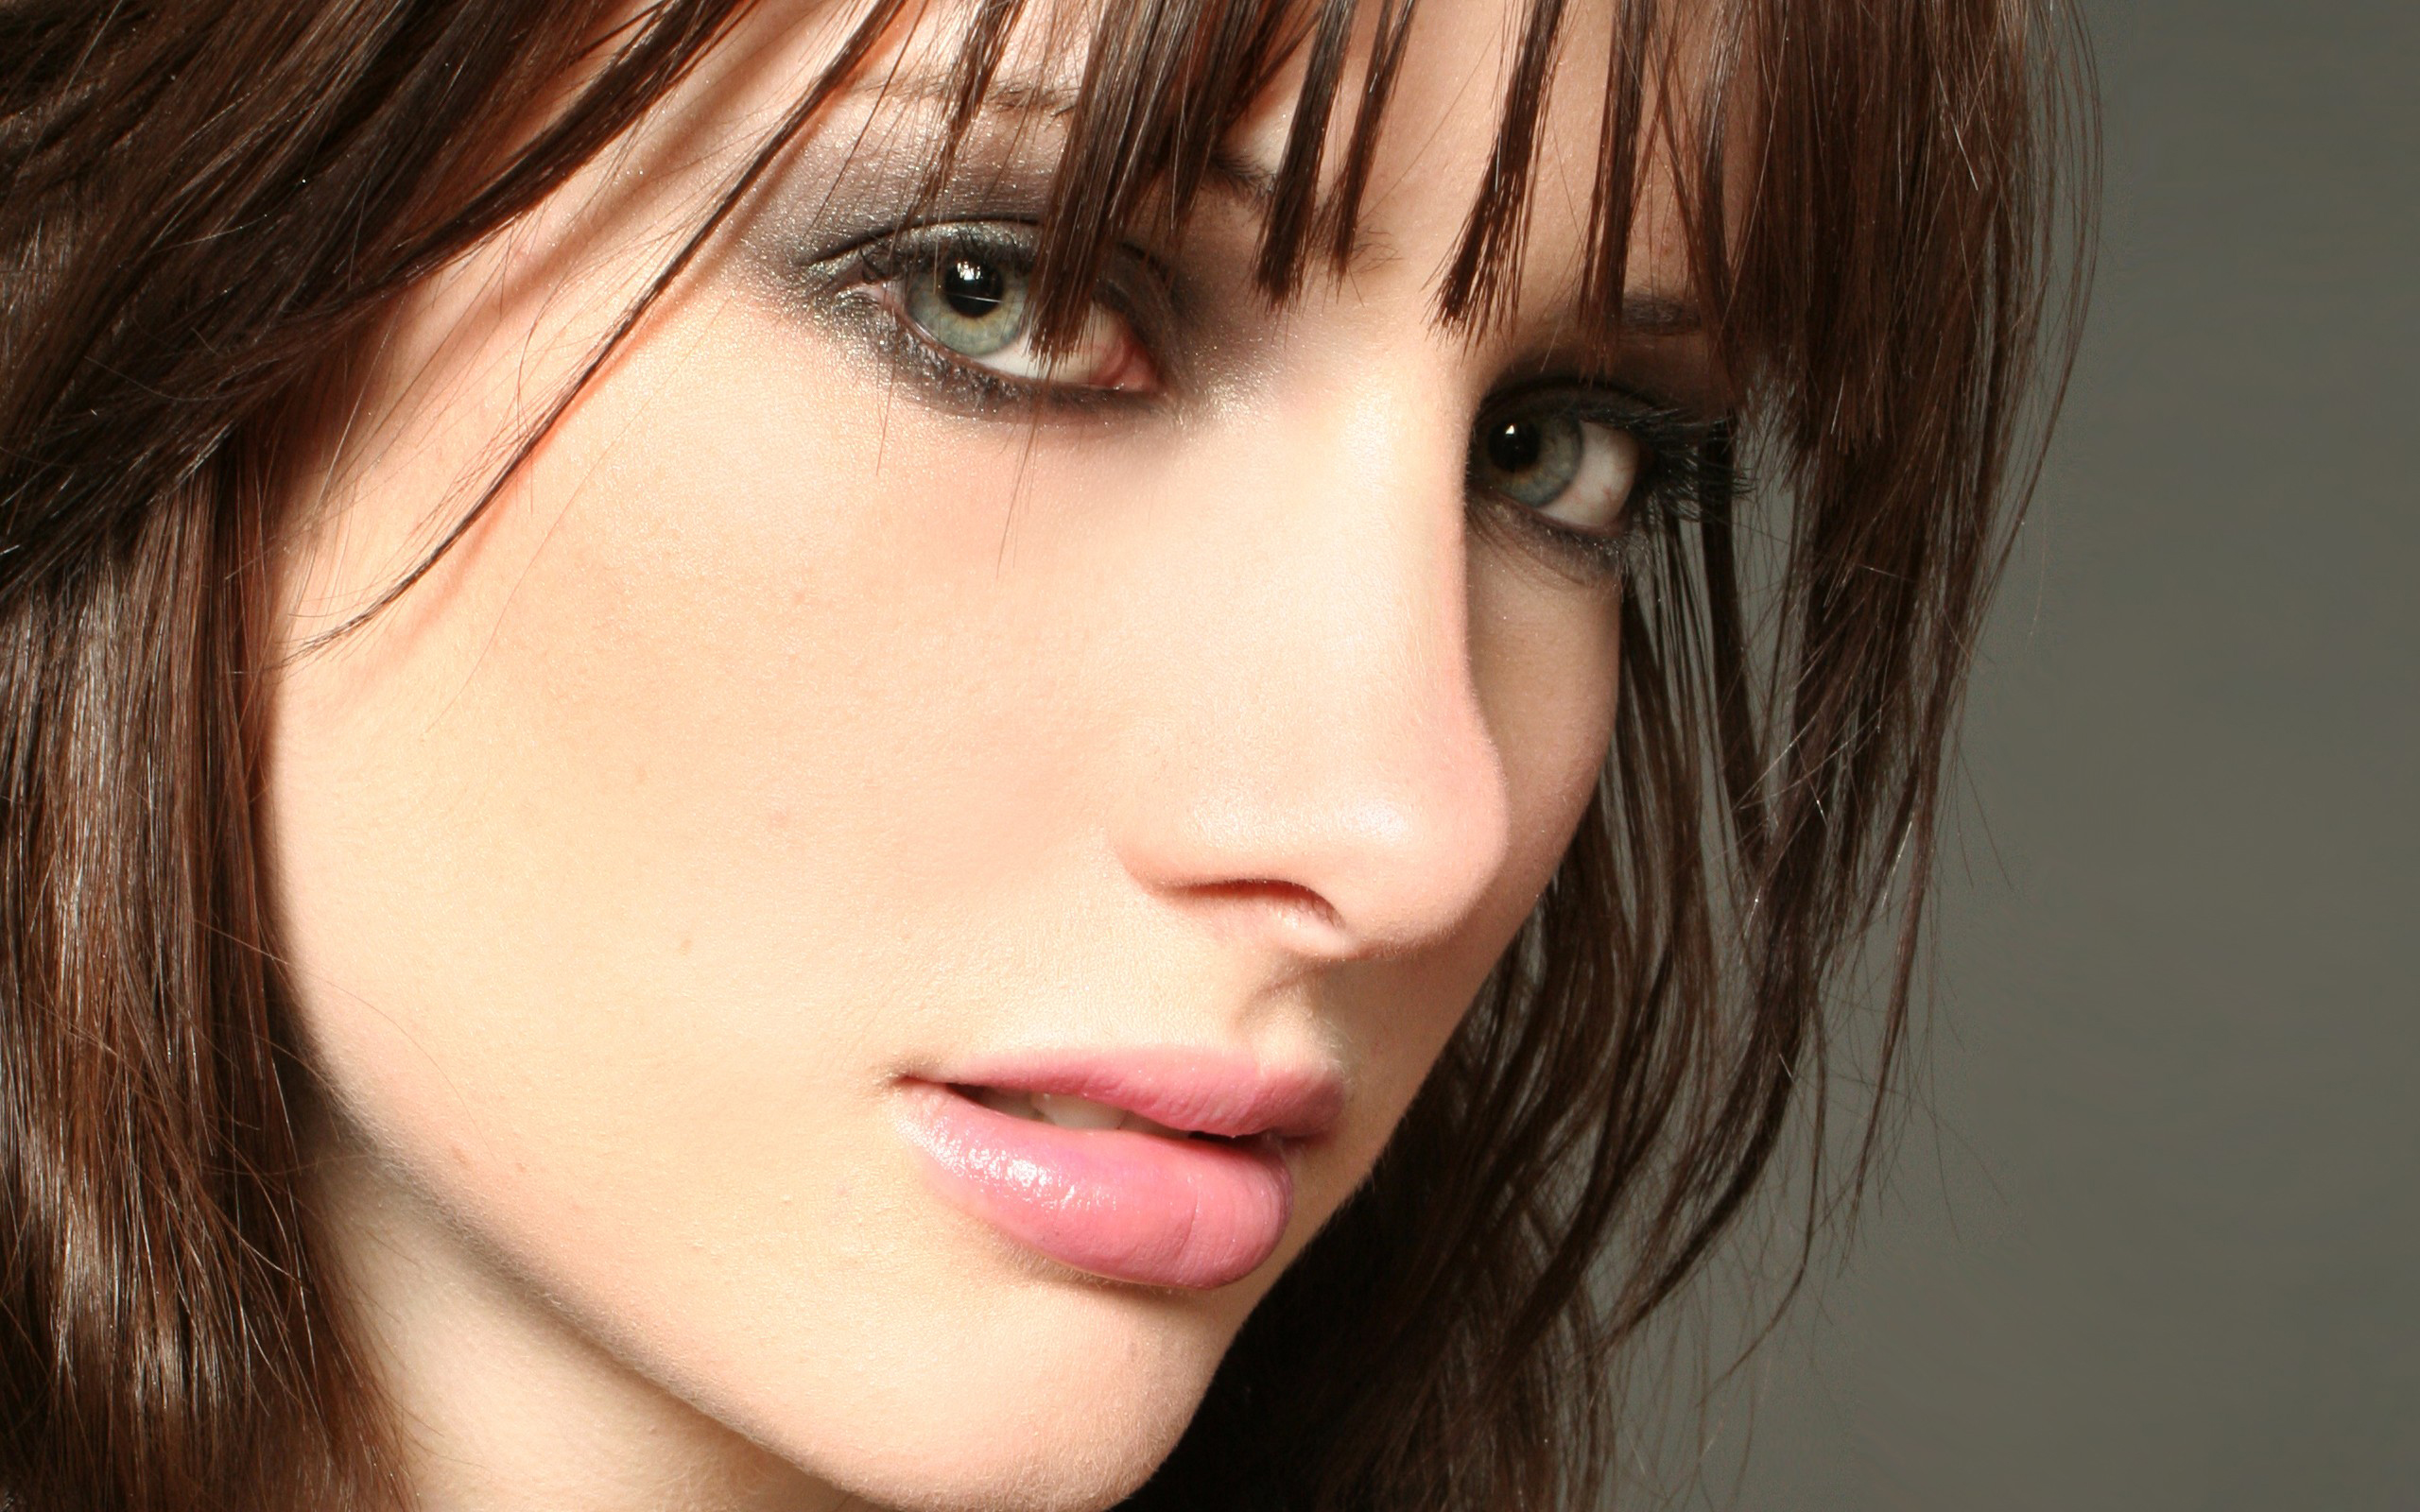 брюнетка девушка лицо  № 2704719 без смс